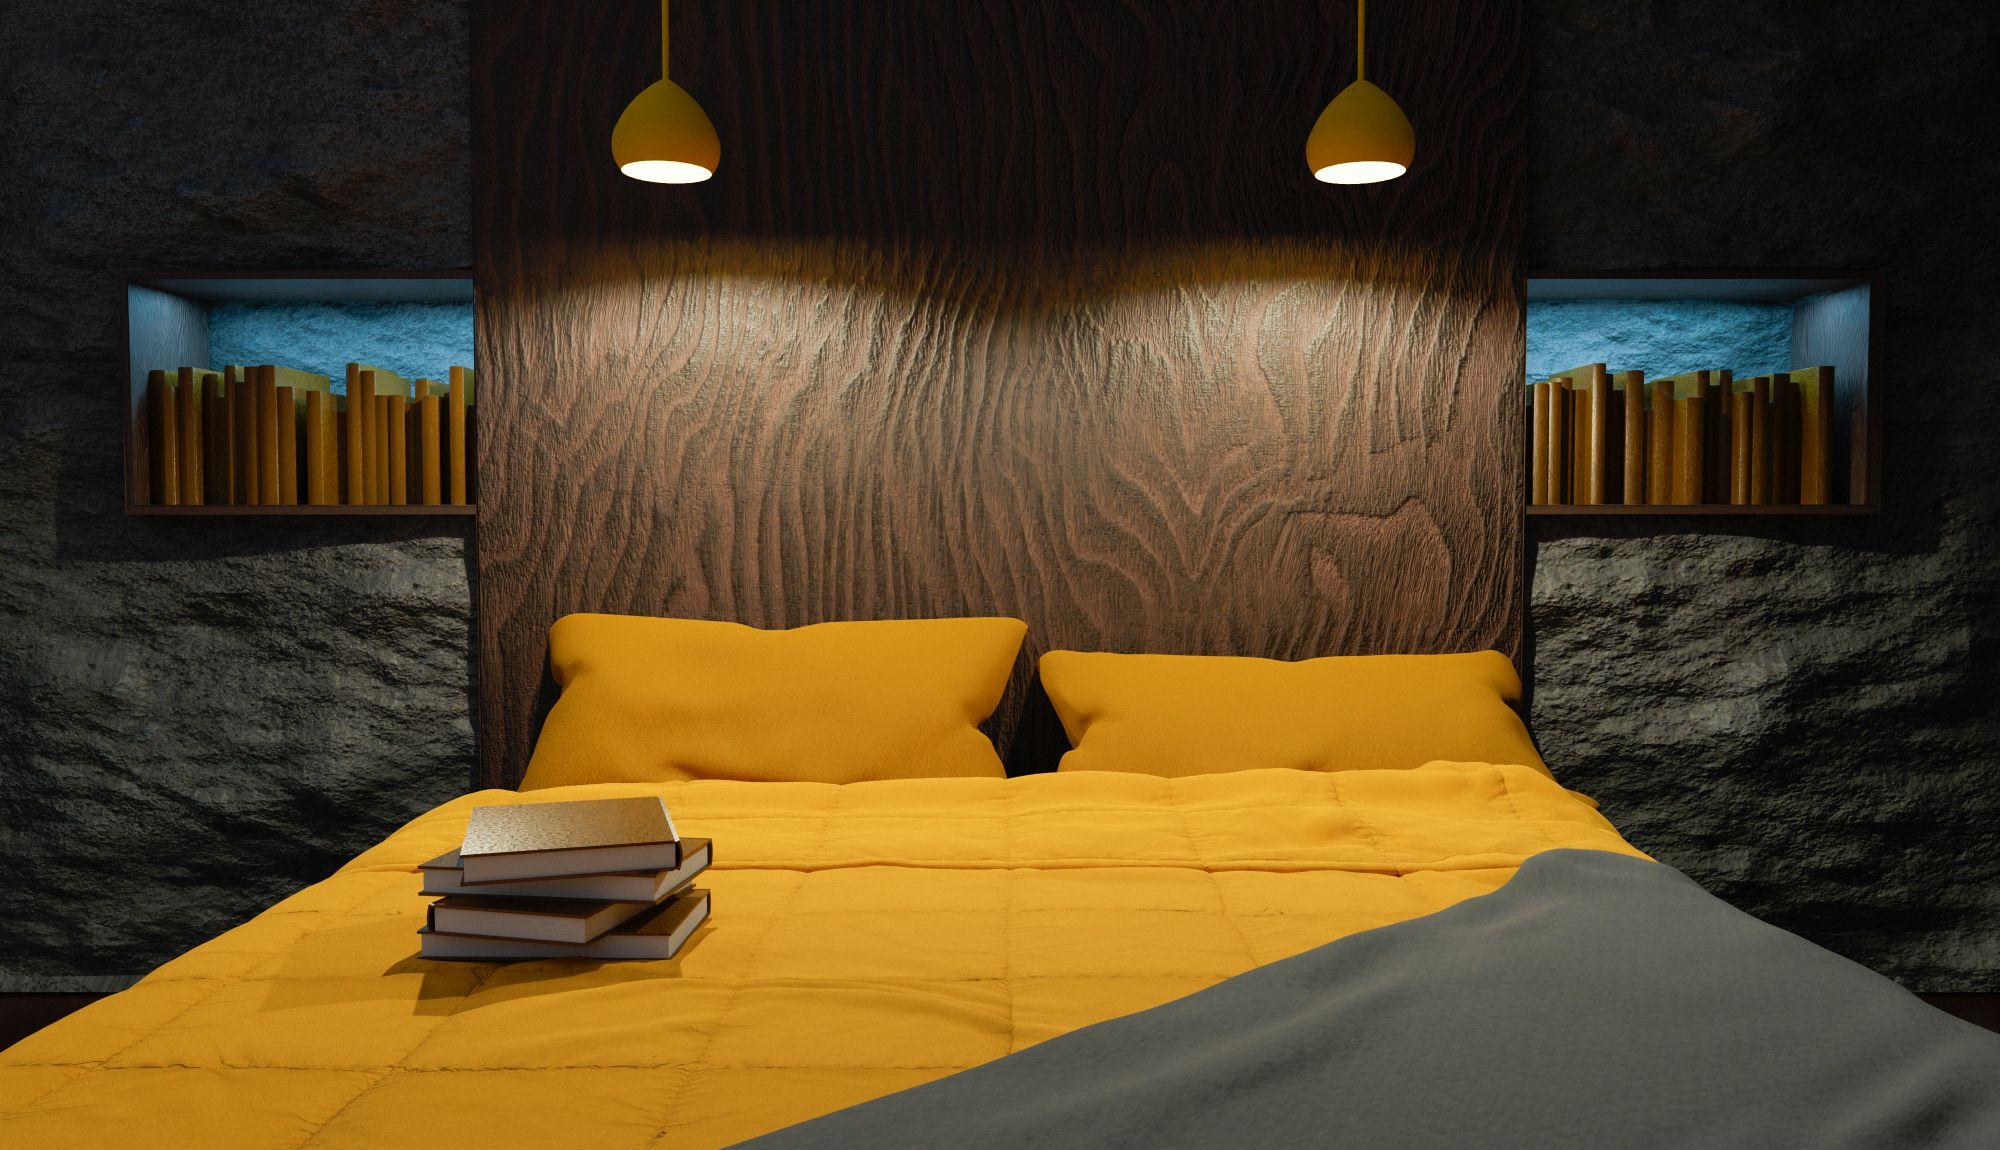 Hotel Room Stock photos by Vecteezy